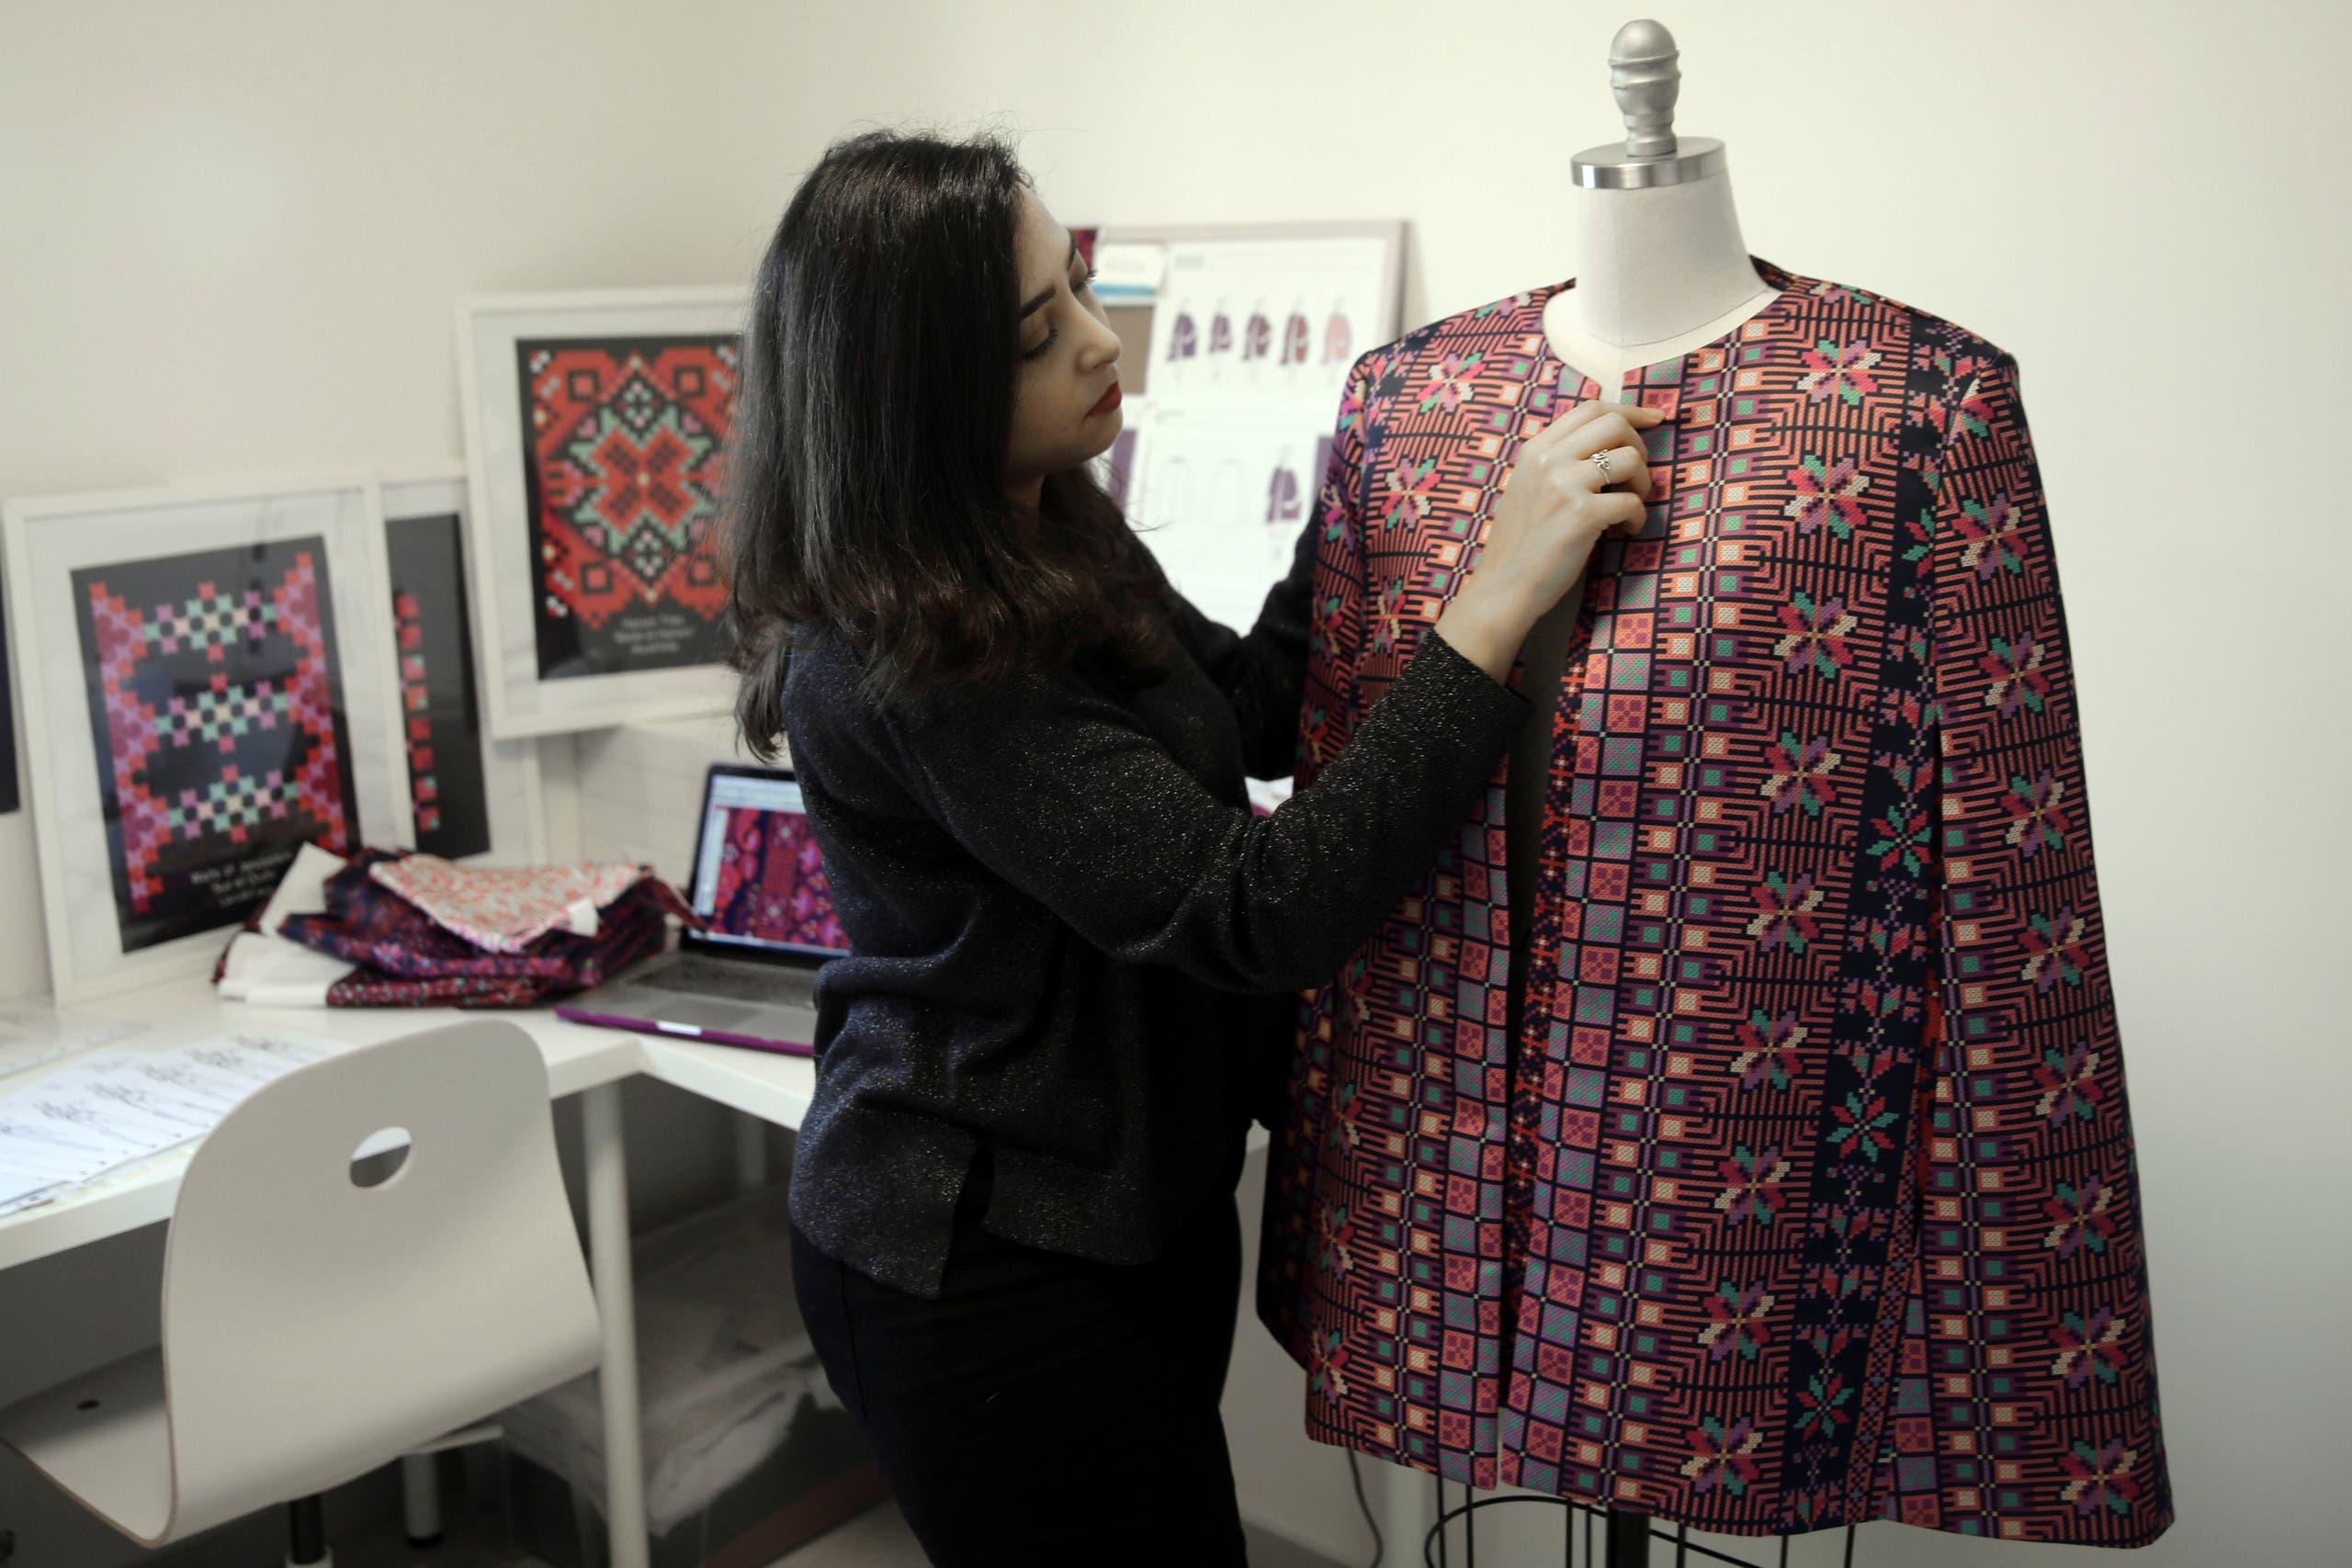 Designer Natalie Tahhan works on a modern version of the traditional Palestinian thobe in her studio in East Jerusalem on Jan. 29, 2019. (AP)